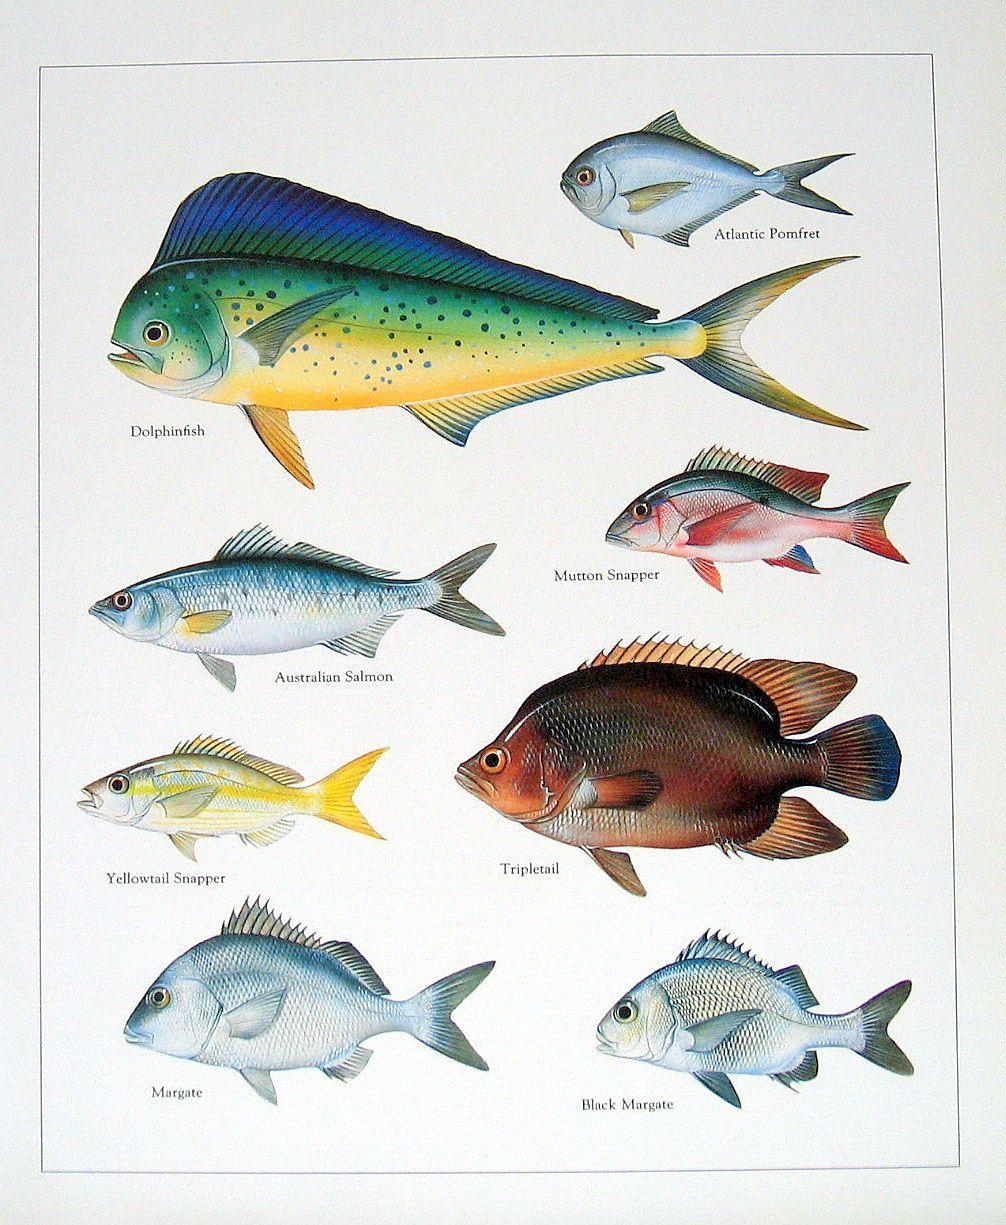 Dolphinfish, Australian Salmon, Mutton Snapper, etc. Vintage 1984 ...